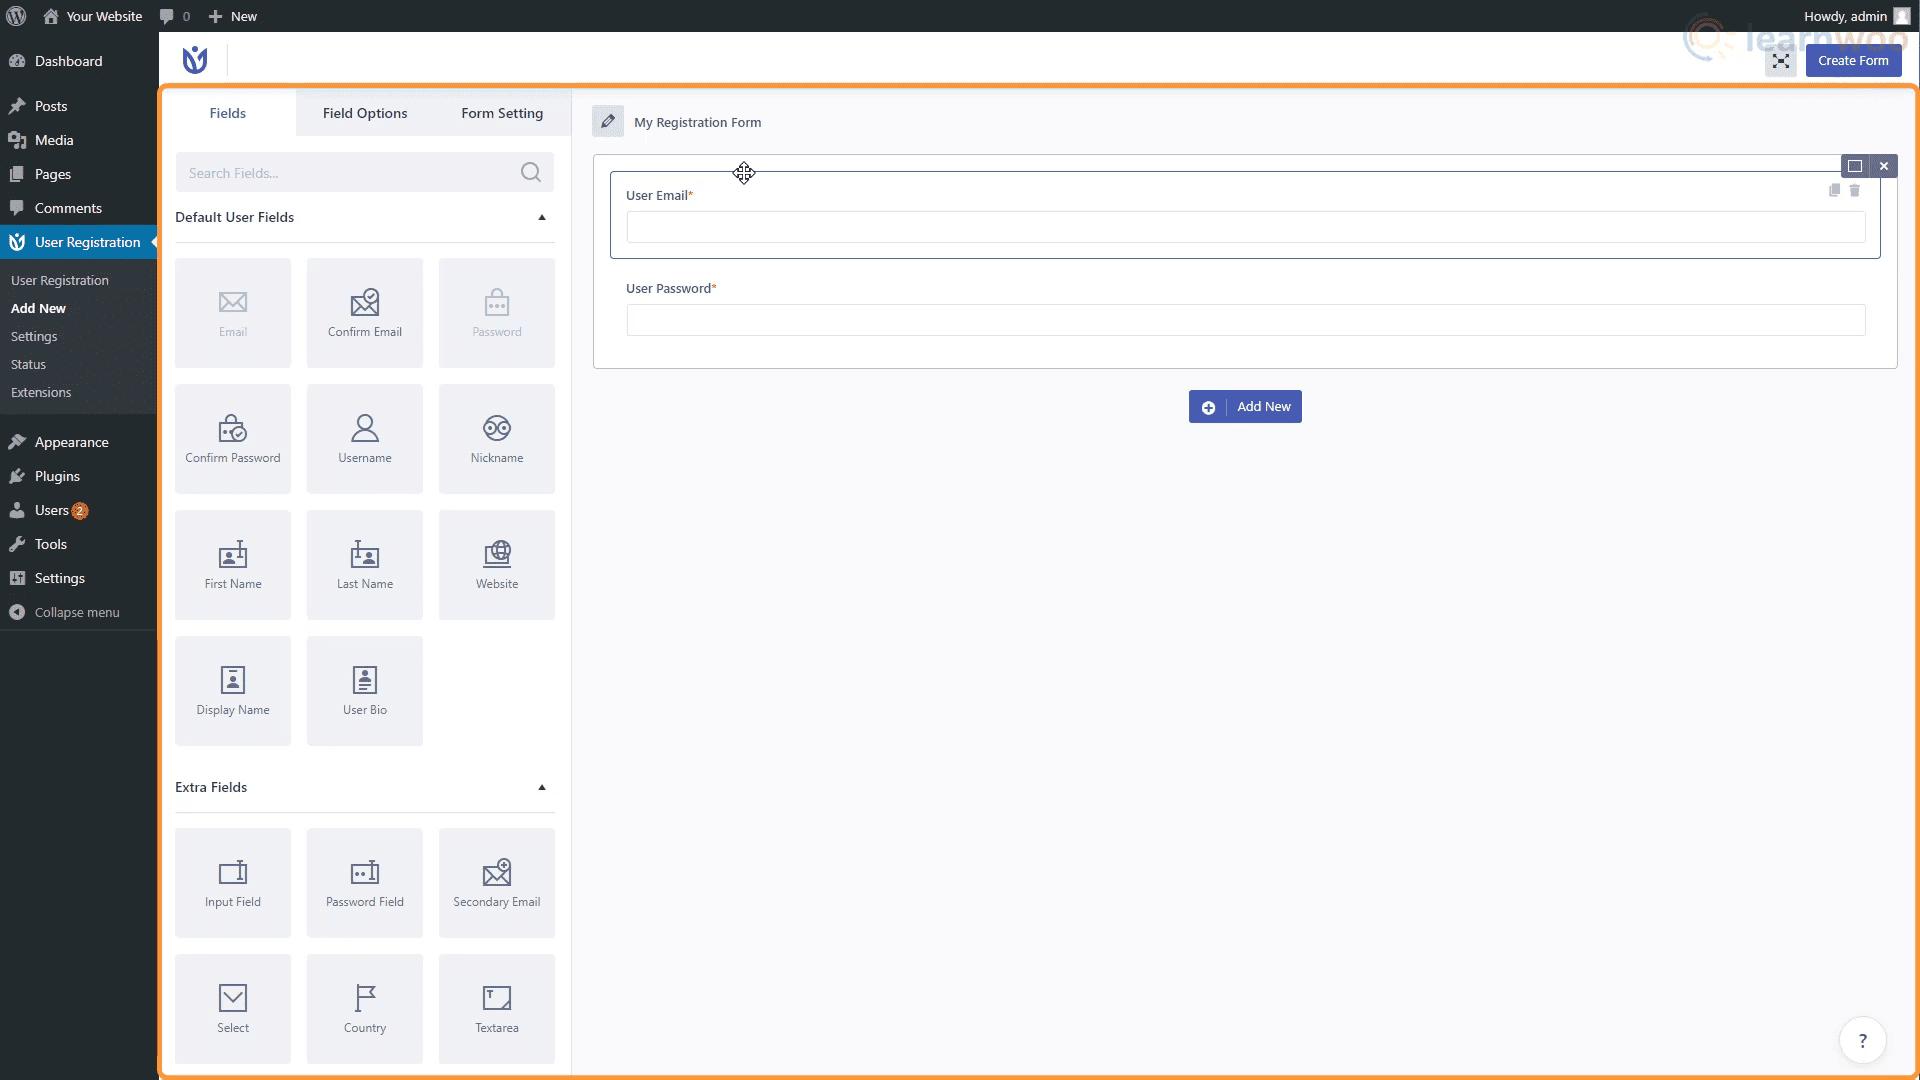 Plug-in d'enregistrement des utilisateurs